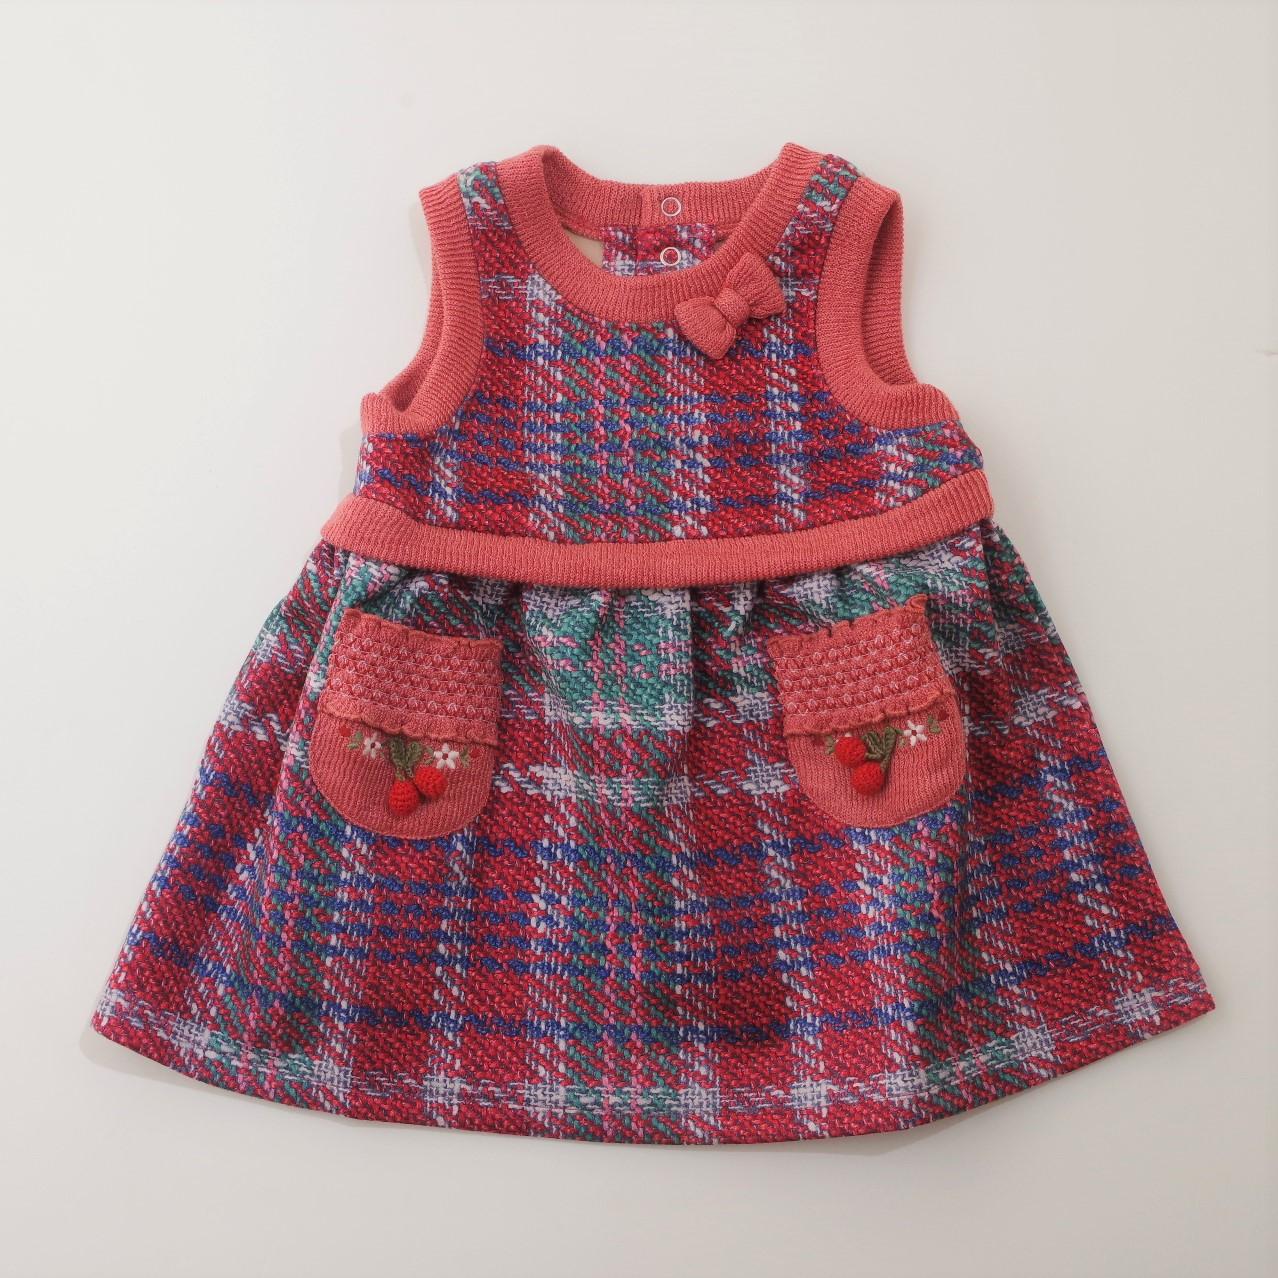 Souris(スーリー) 格子プリントジャンパースカート 90-140cm (195577-295577-RD)